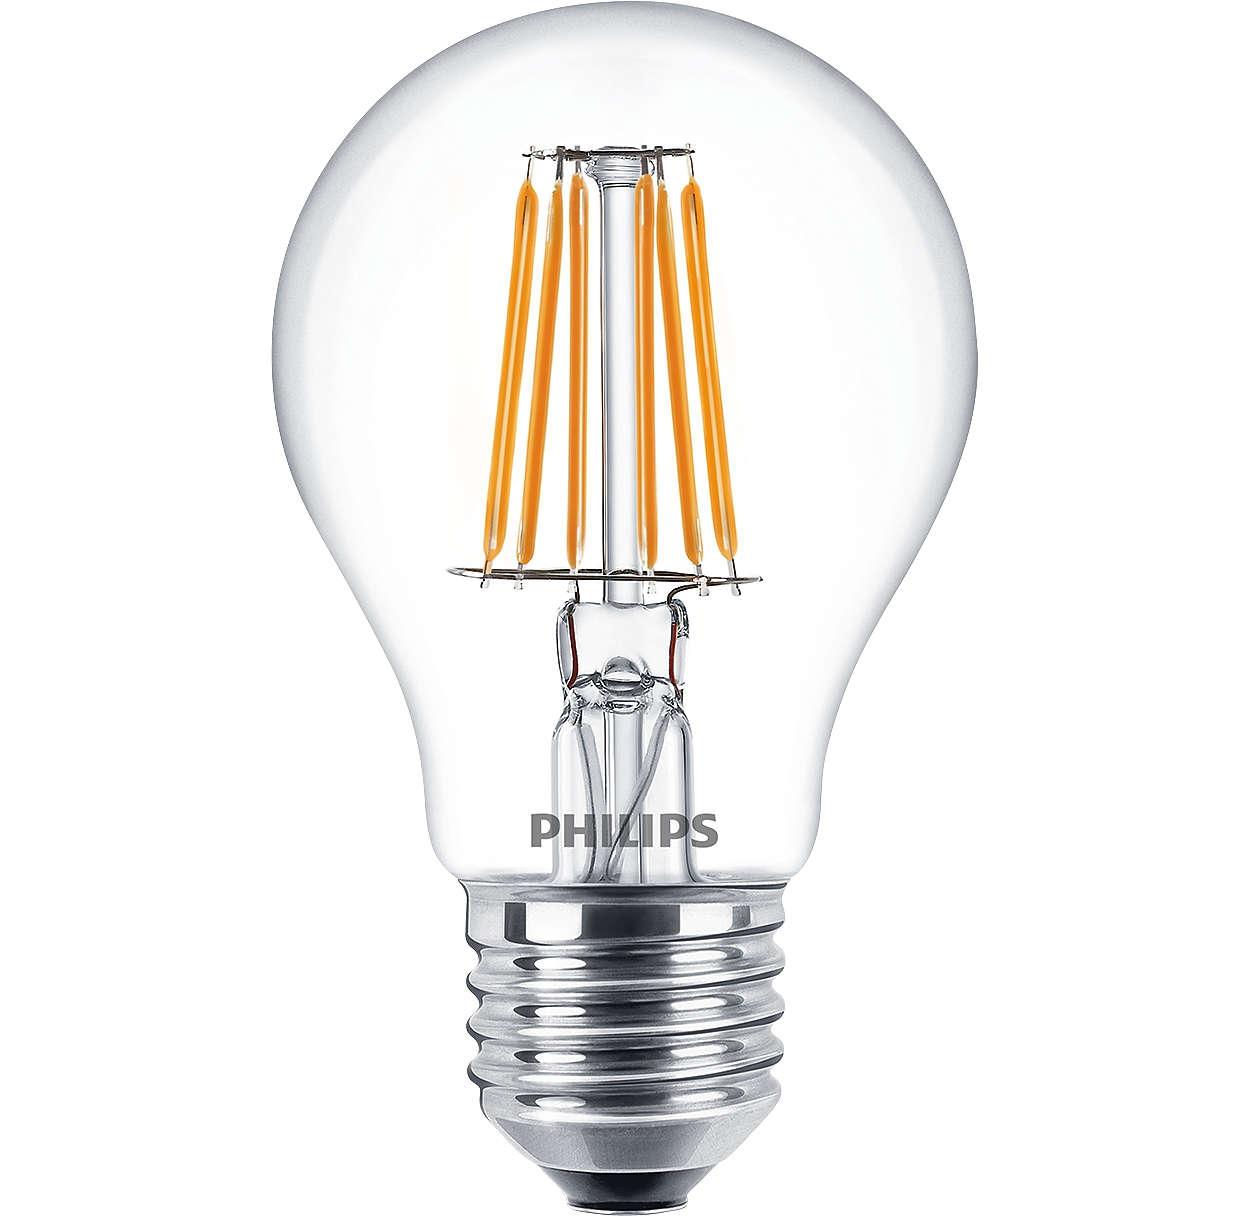 cla ledbulb nd 7 5 60w e27 ww a60 cl classic led lamps. Black Bedroom Furniture Sets. Home Design Ideas